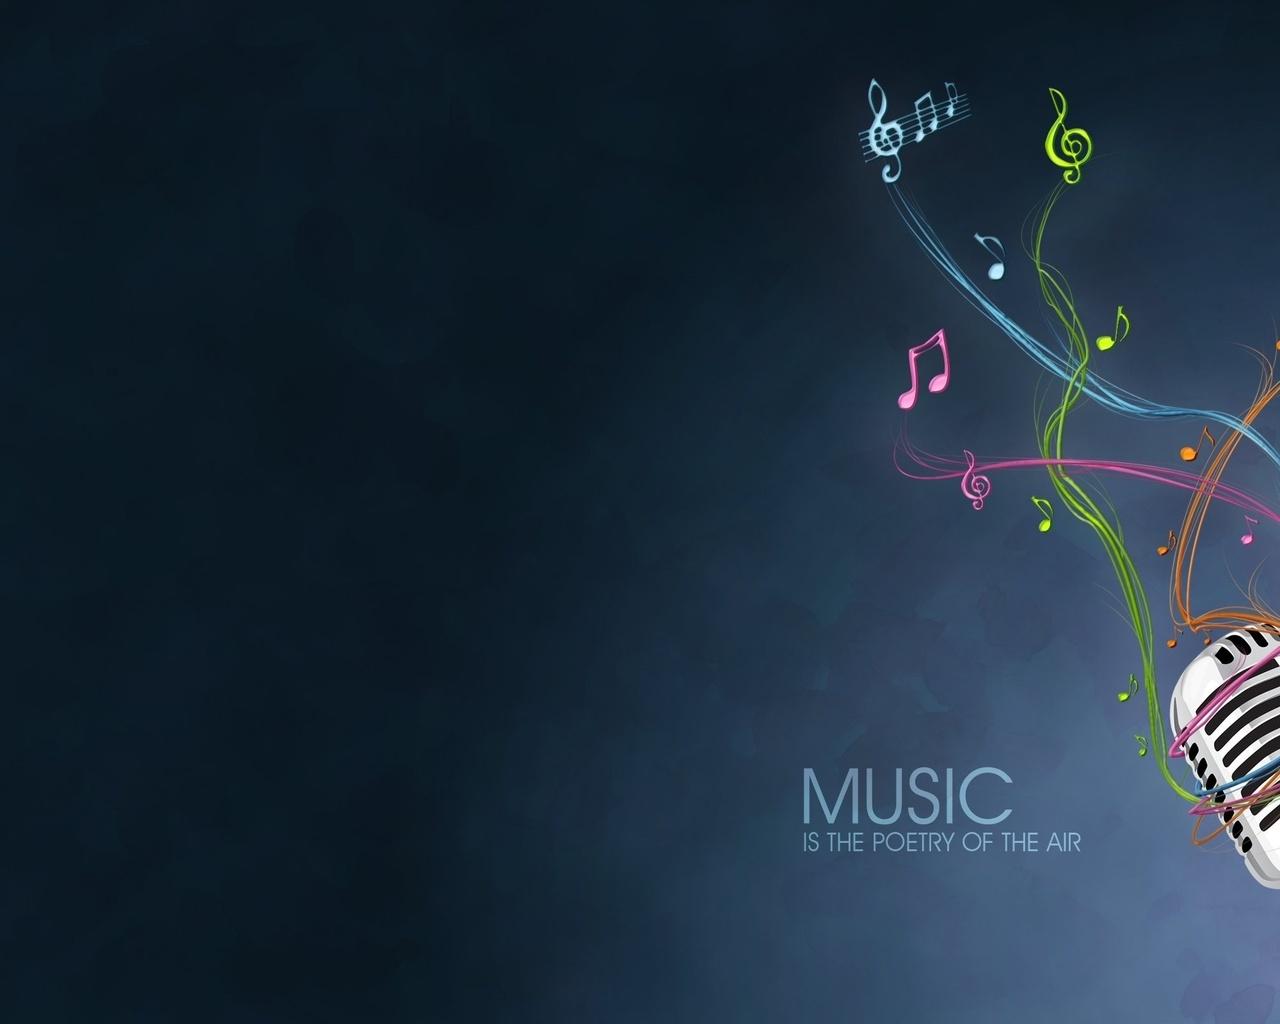 Musica wallpaper